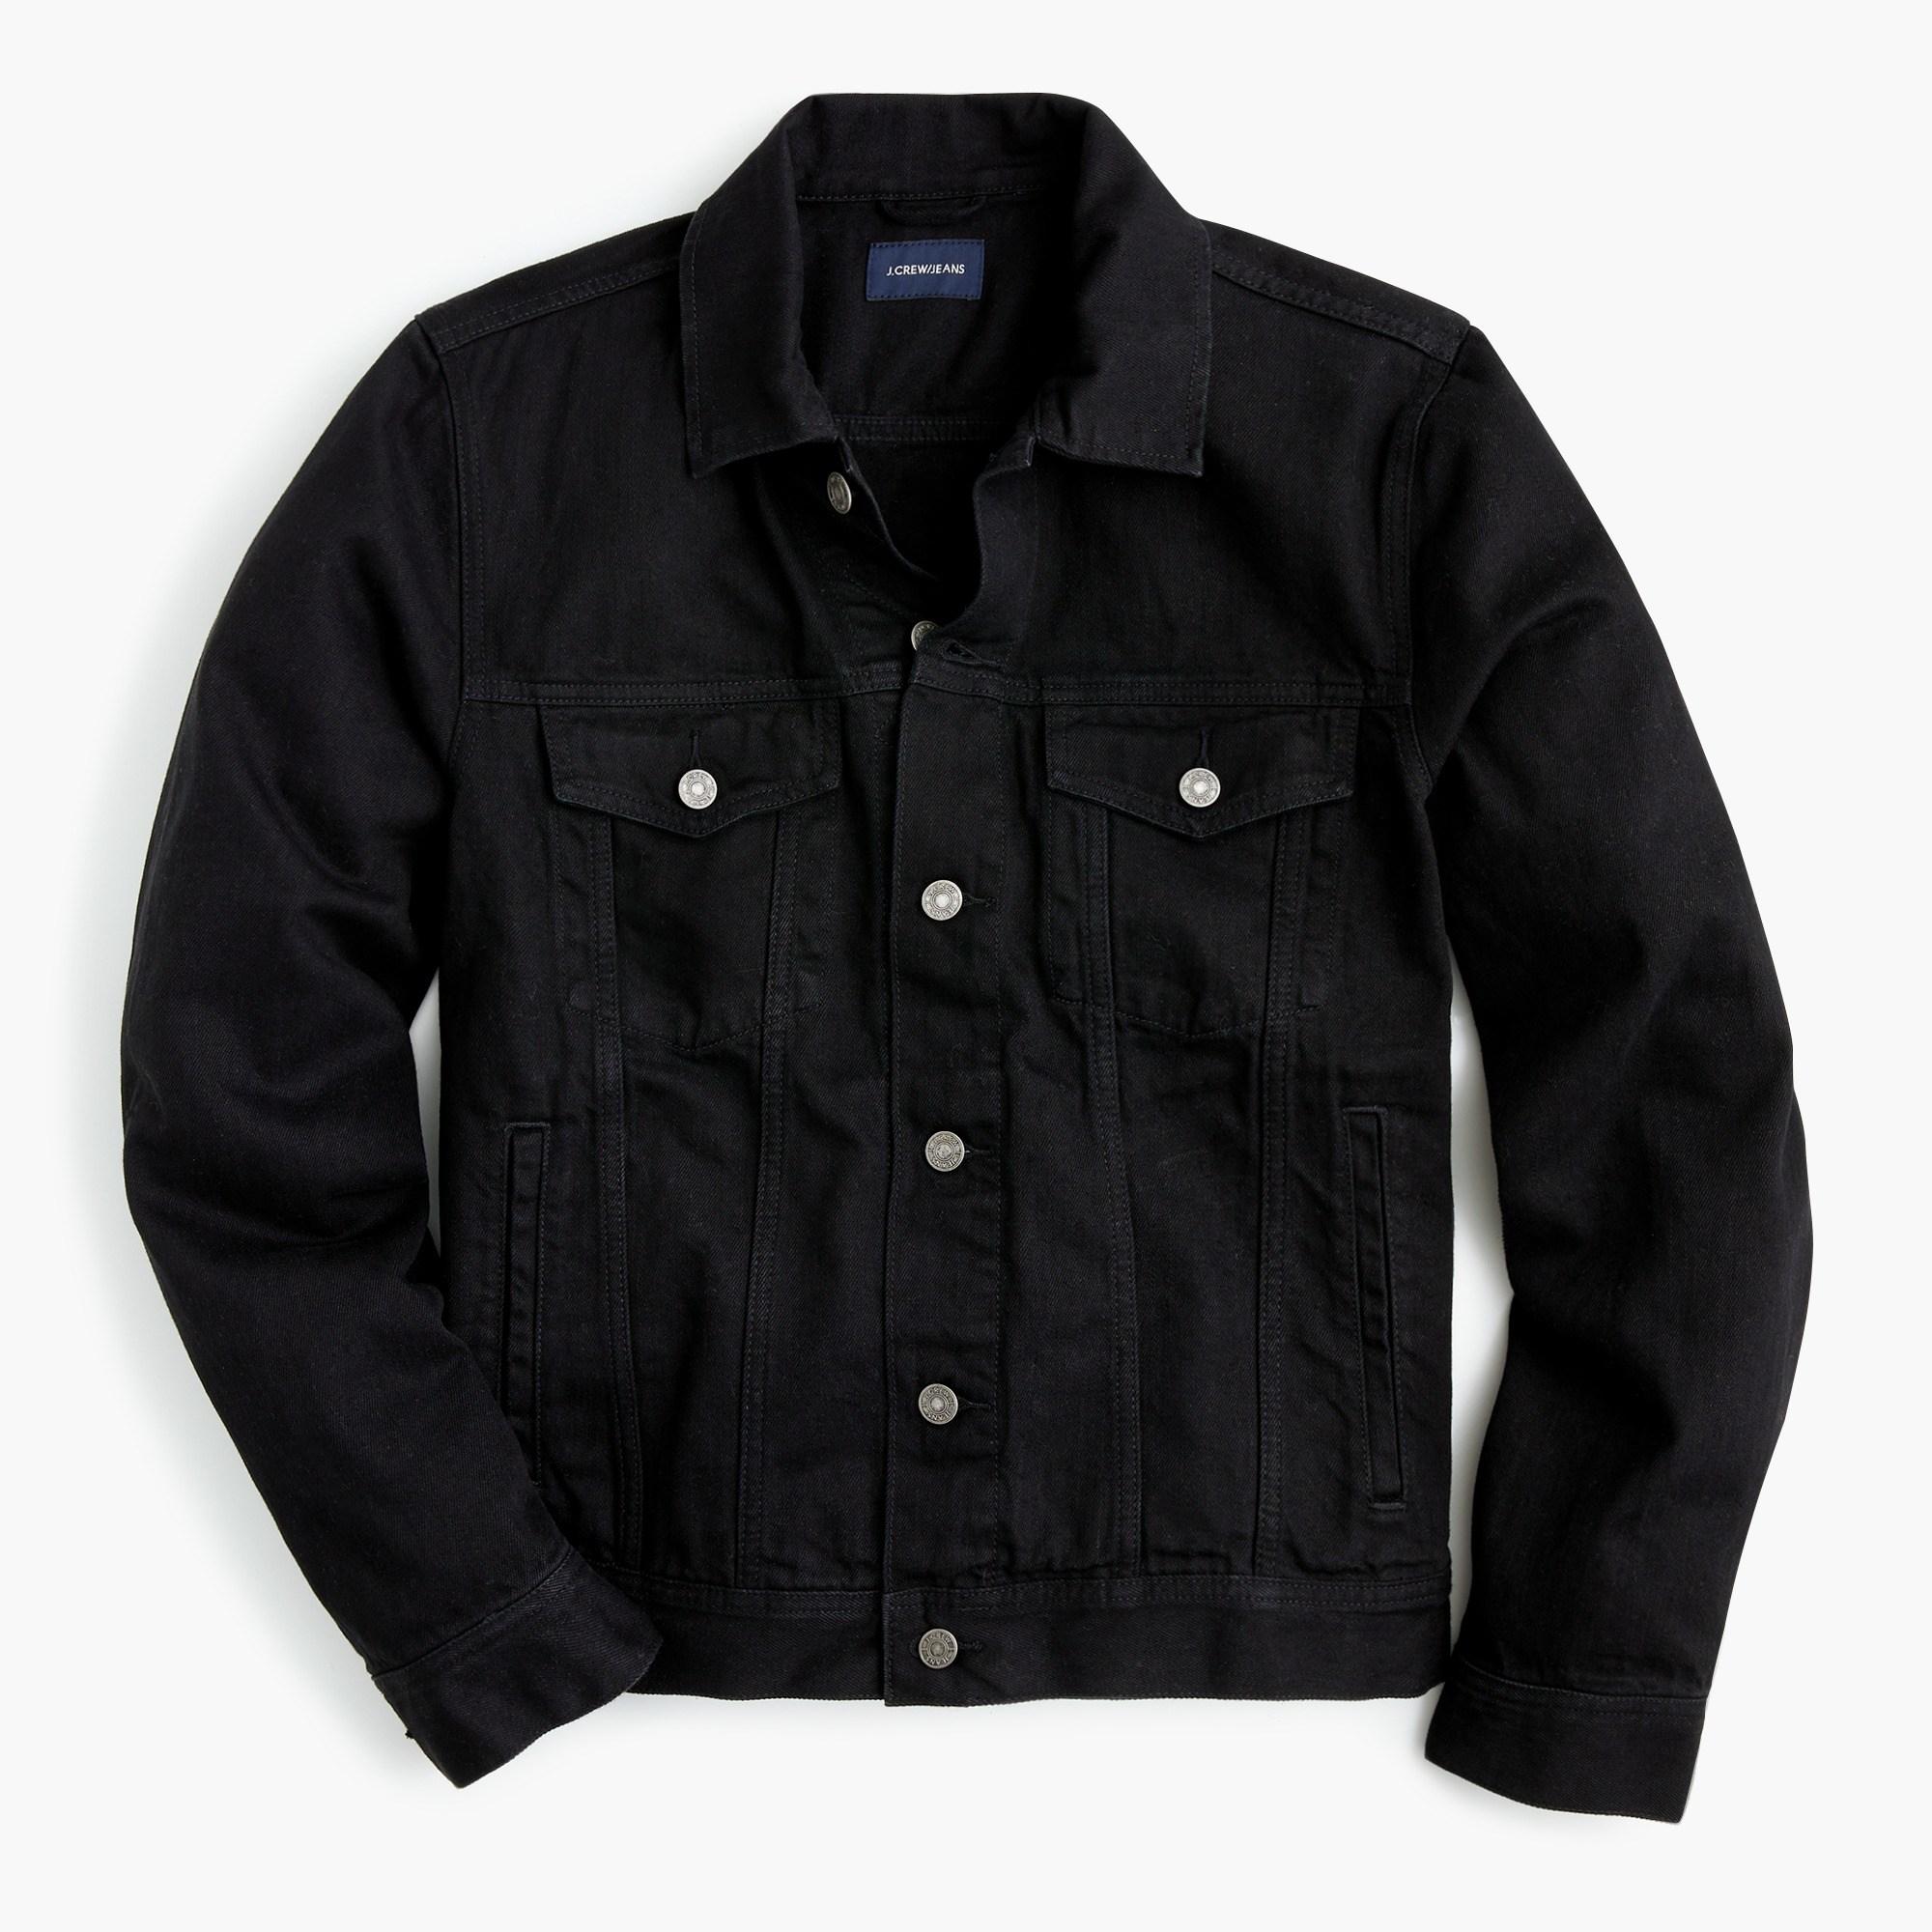 Men's Jackets & Coats : Men's Outerwear | J.Crew